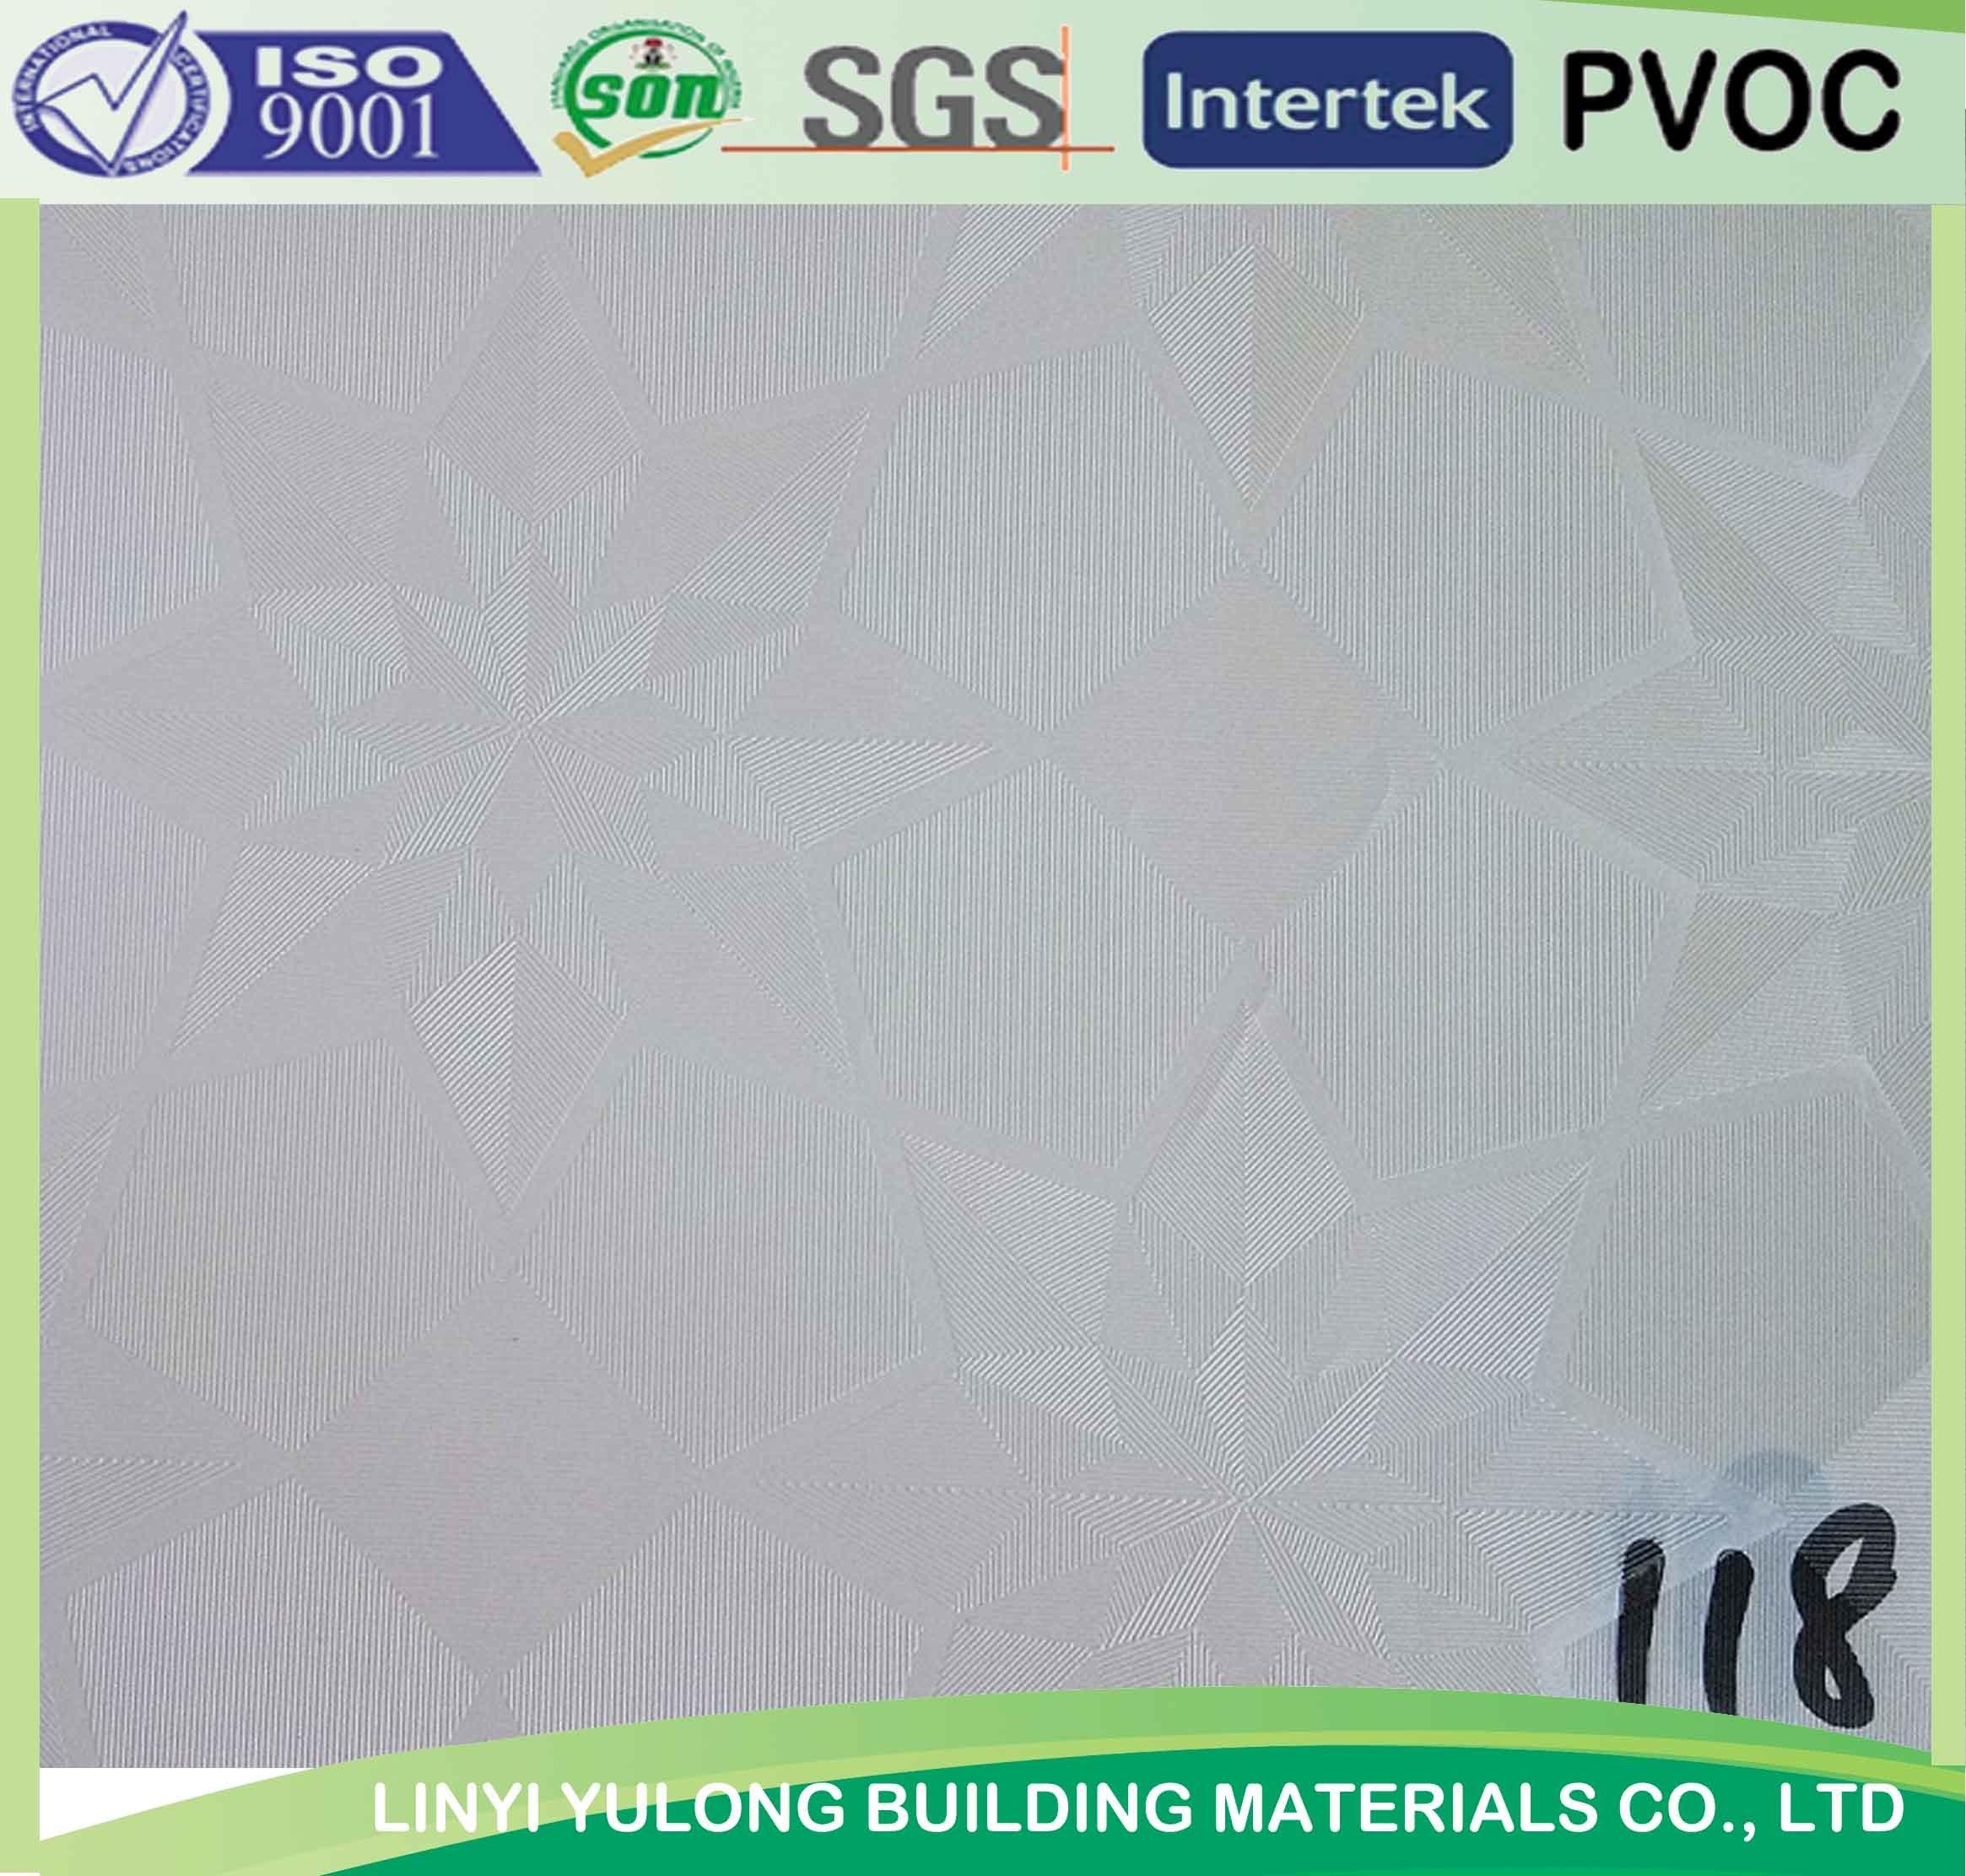 China 118 pvc gypsum ceiling tile with aluminium foil back china china 118 pvc gypsum ceiling tile with aluminium foil back china pvc gypsum ceiling ceiling tiles dailygadgetfo Images